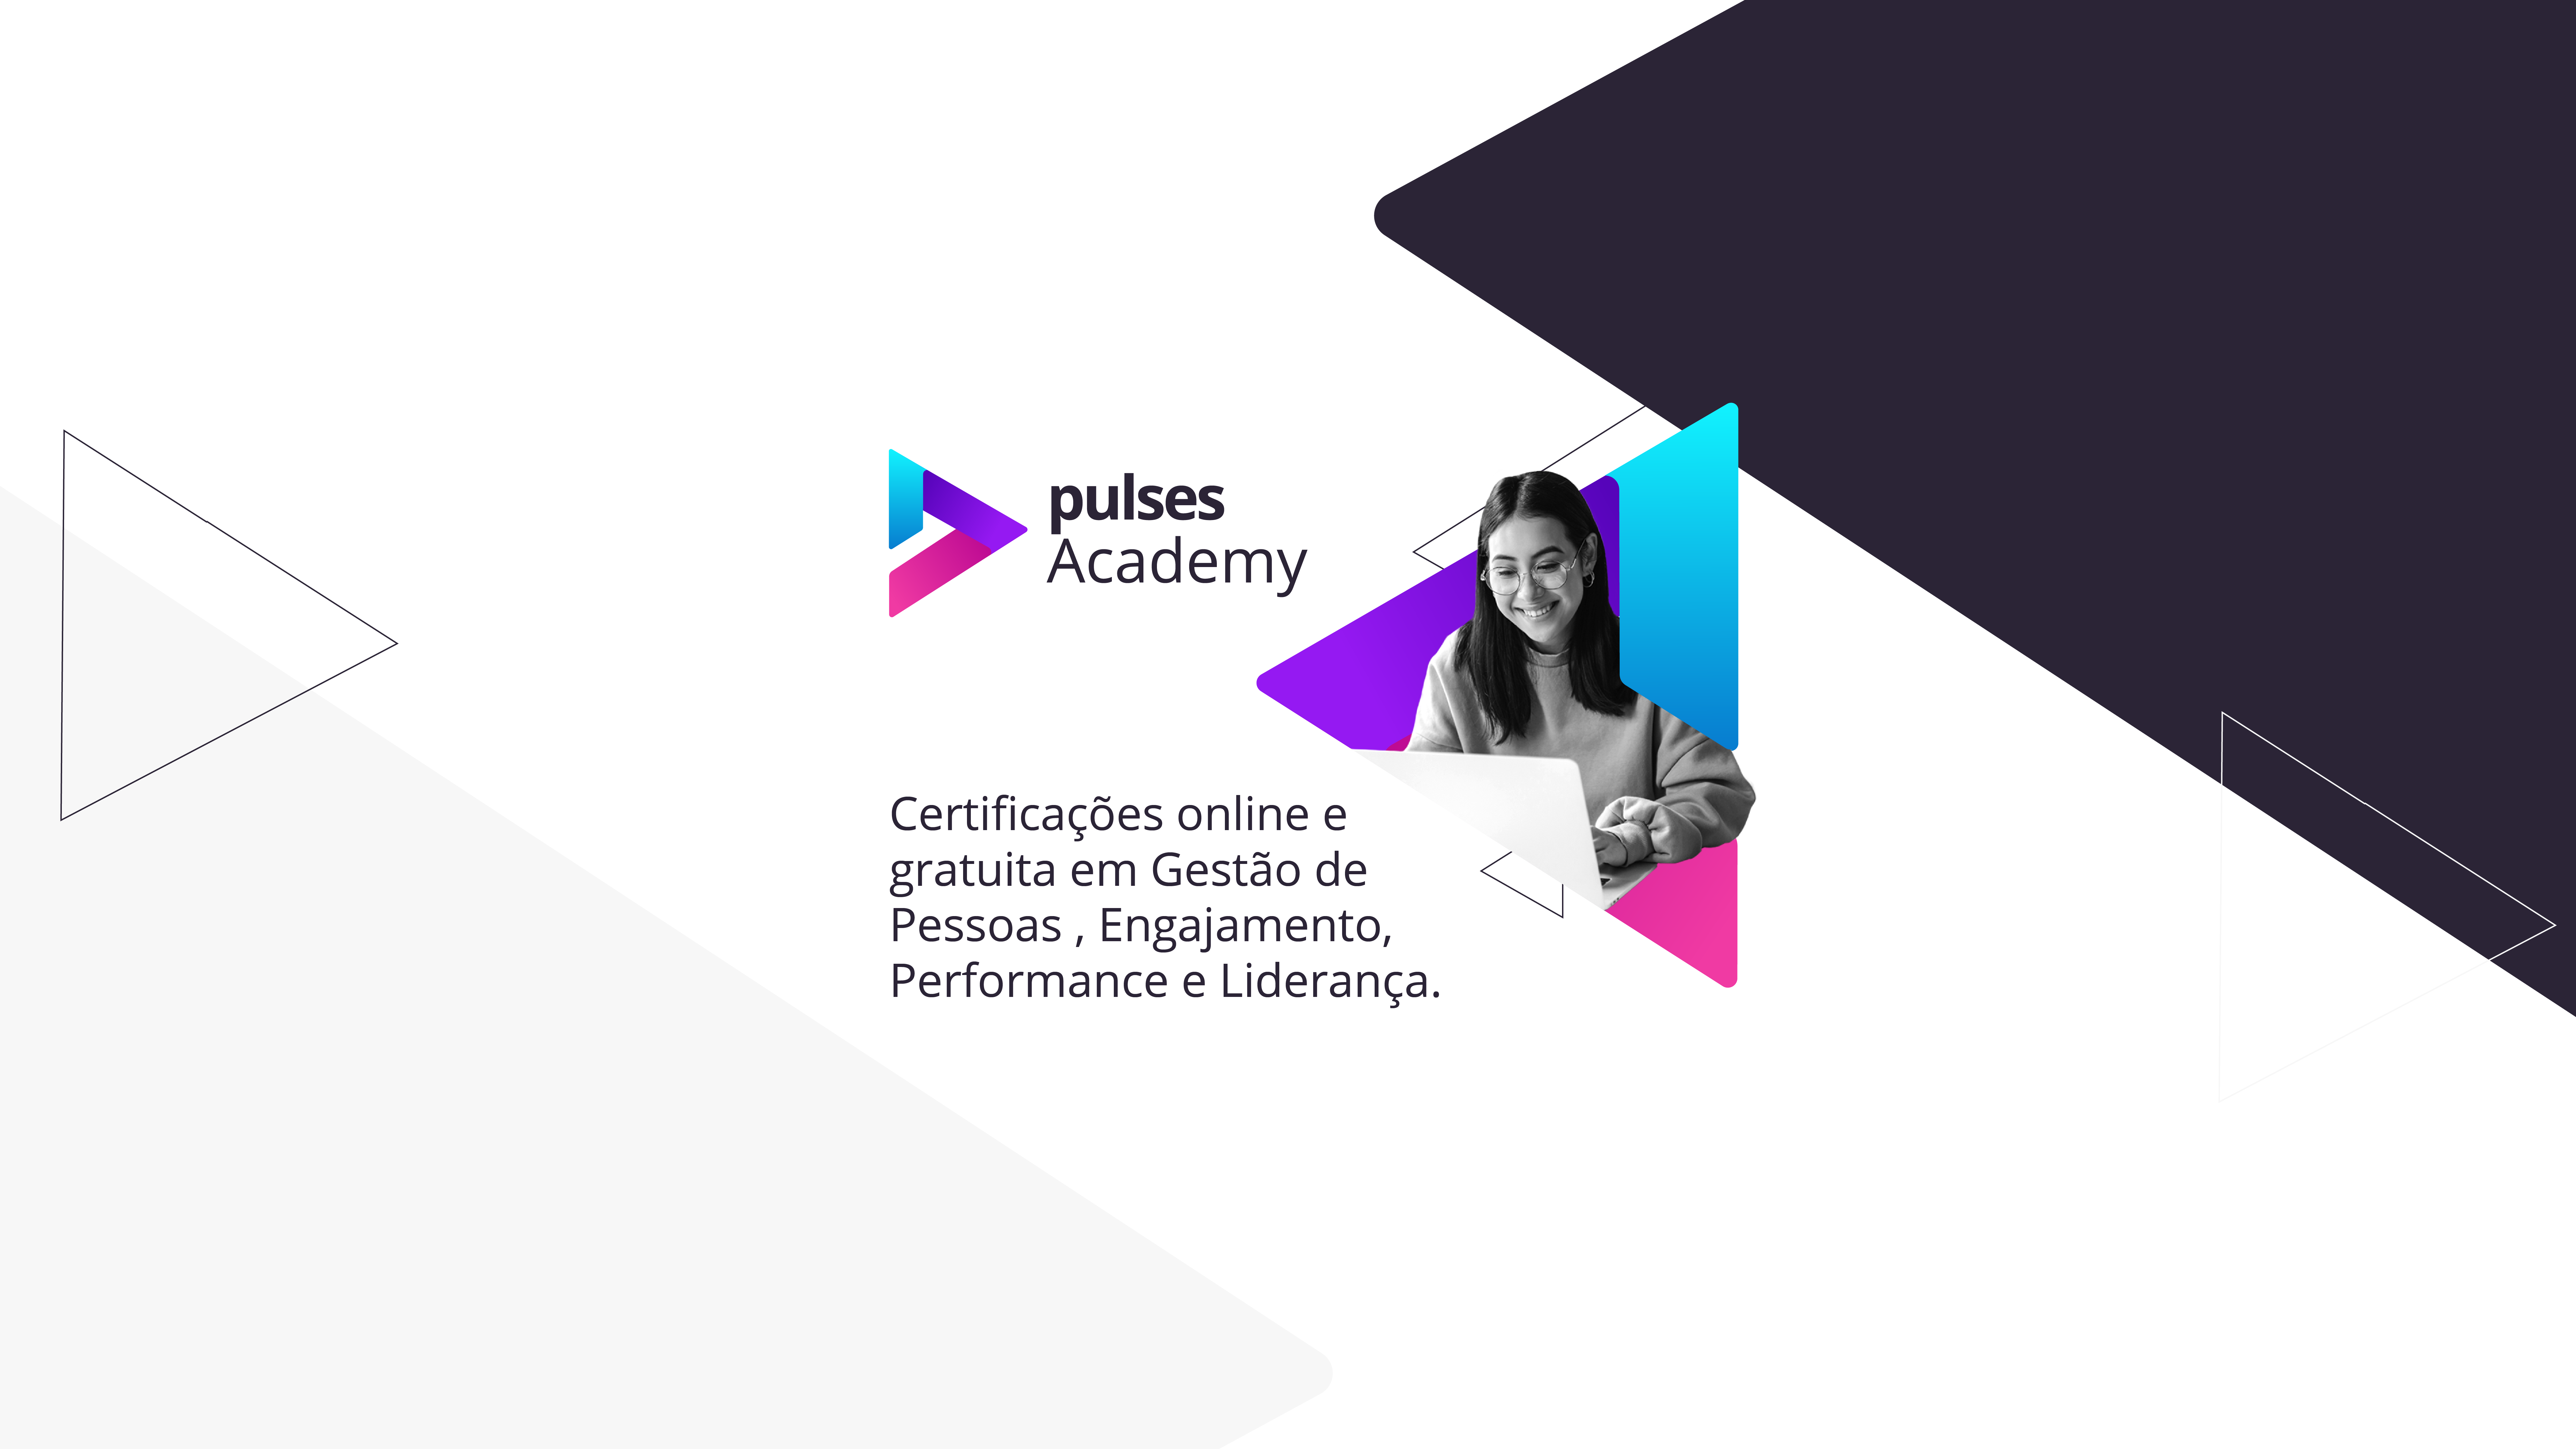 pulses academy